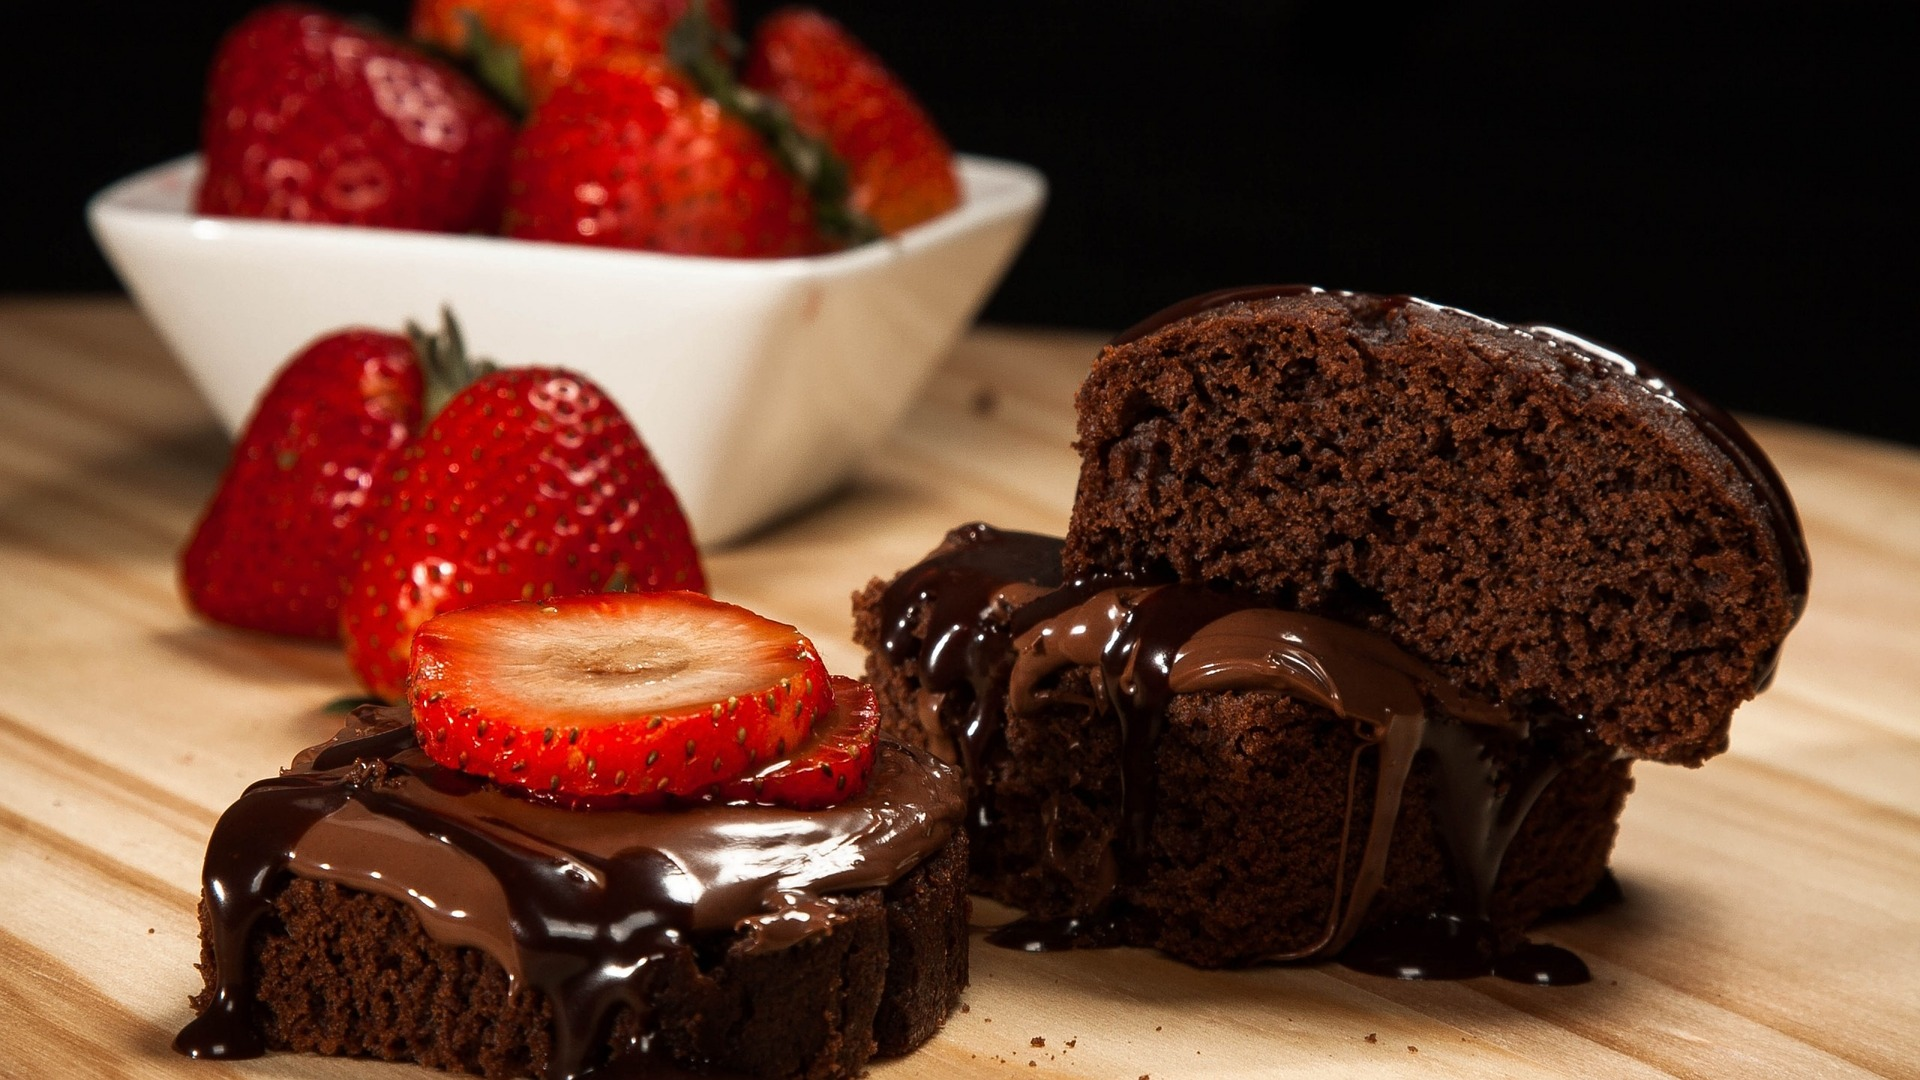 cake-2856551_1920